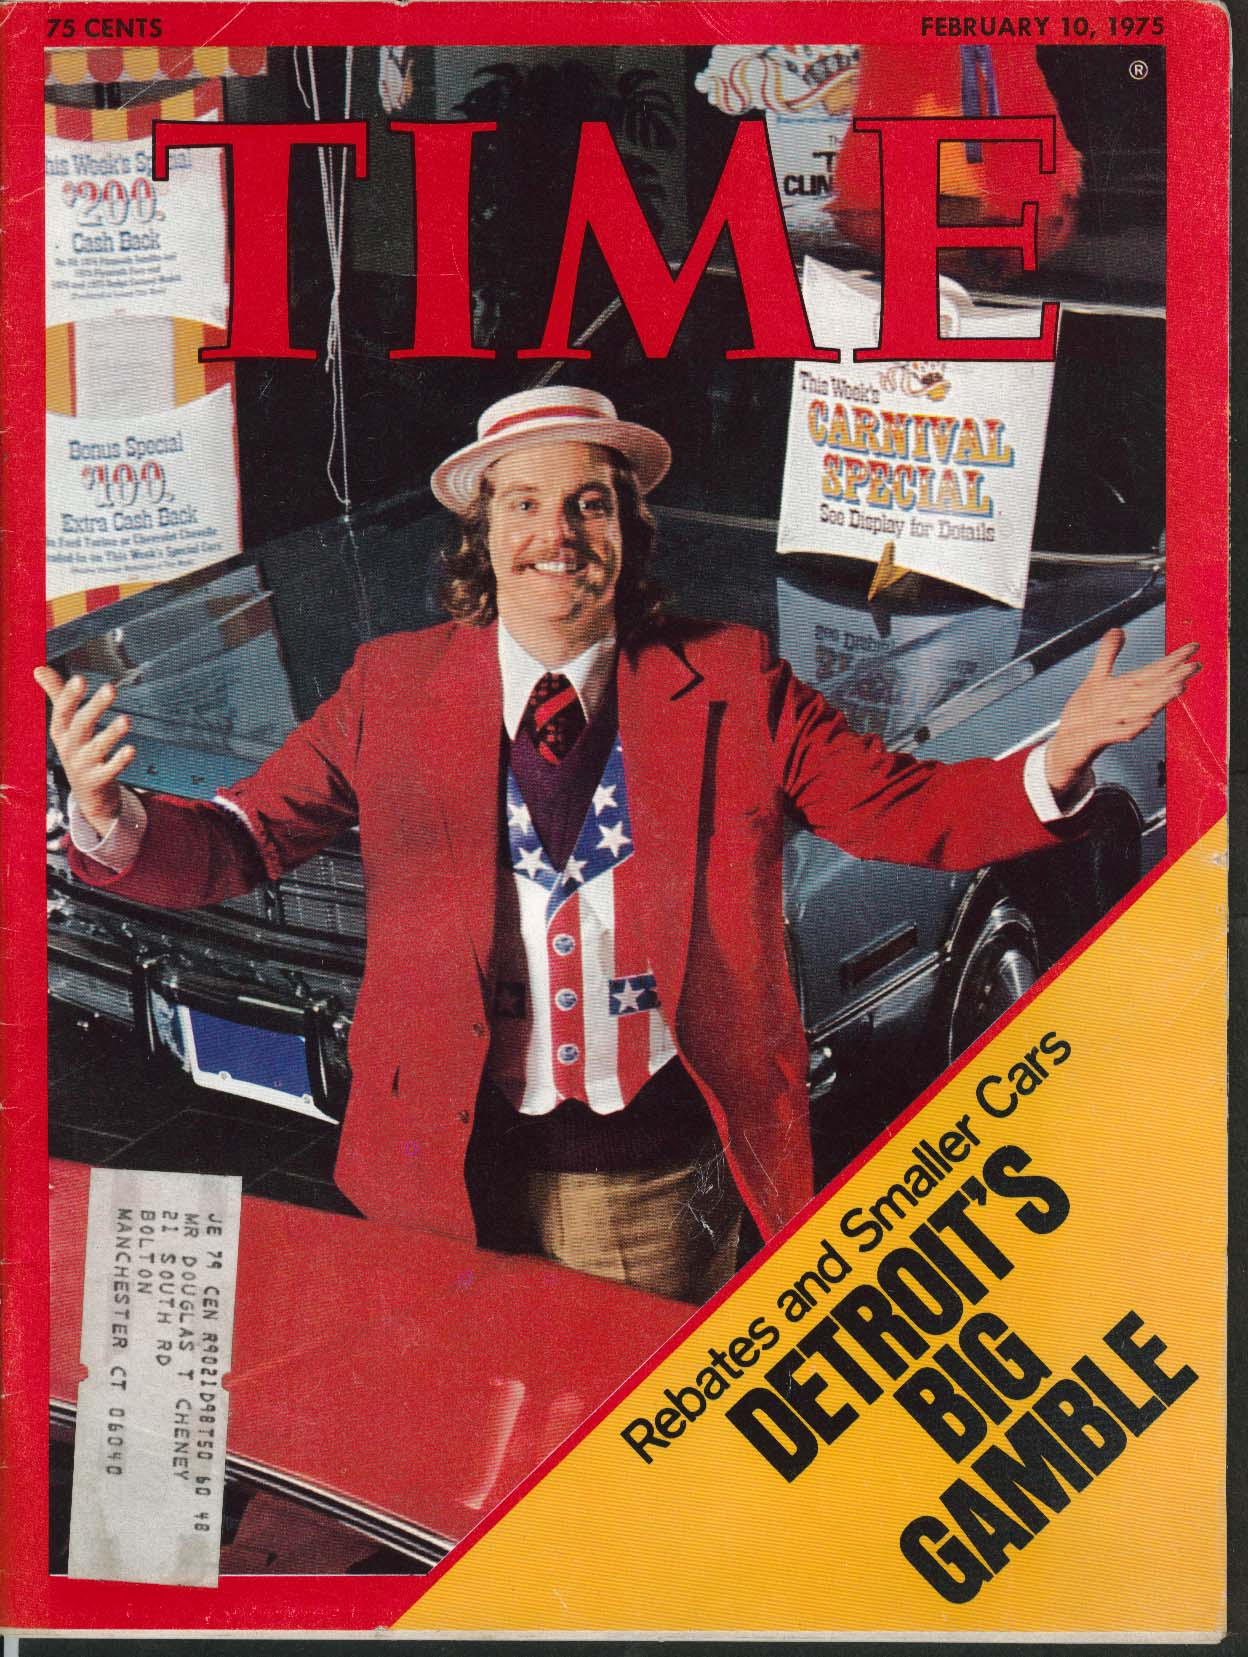 TIME Gerald Ford Budget Richard Nixon Domestic Spying Idi Amin ++ 2/10 1975